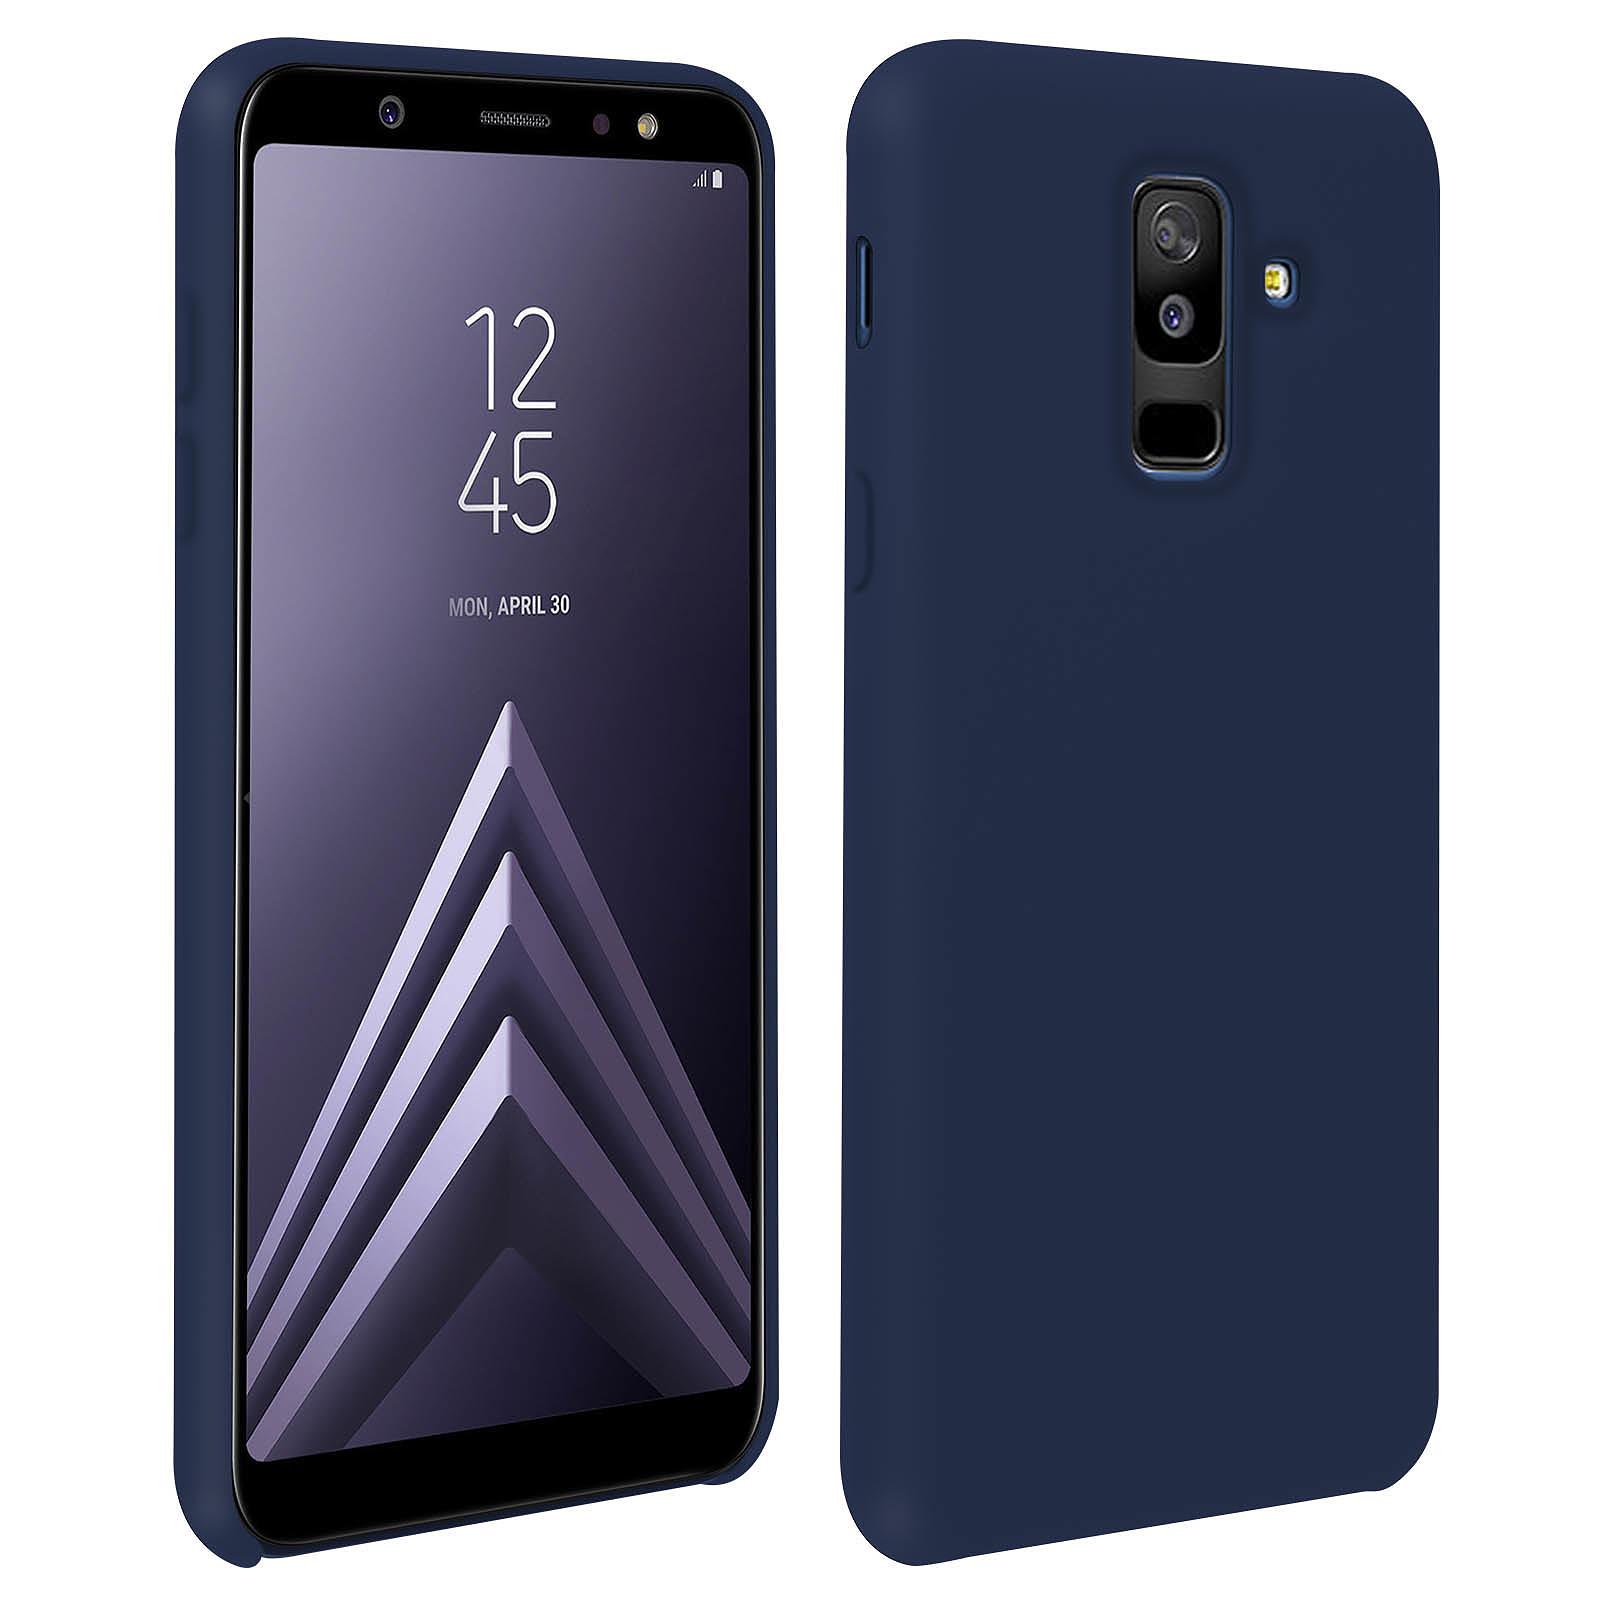 Avizar Coque Bleu Nuit pour Samsung Galaxy A6 Plus